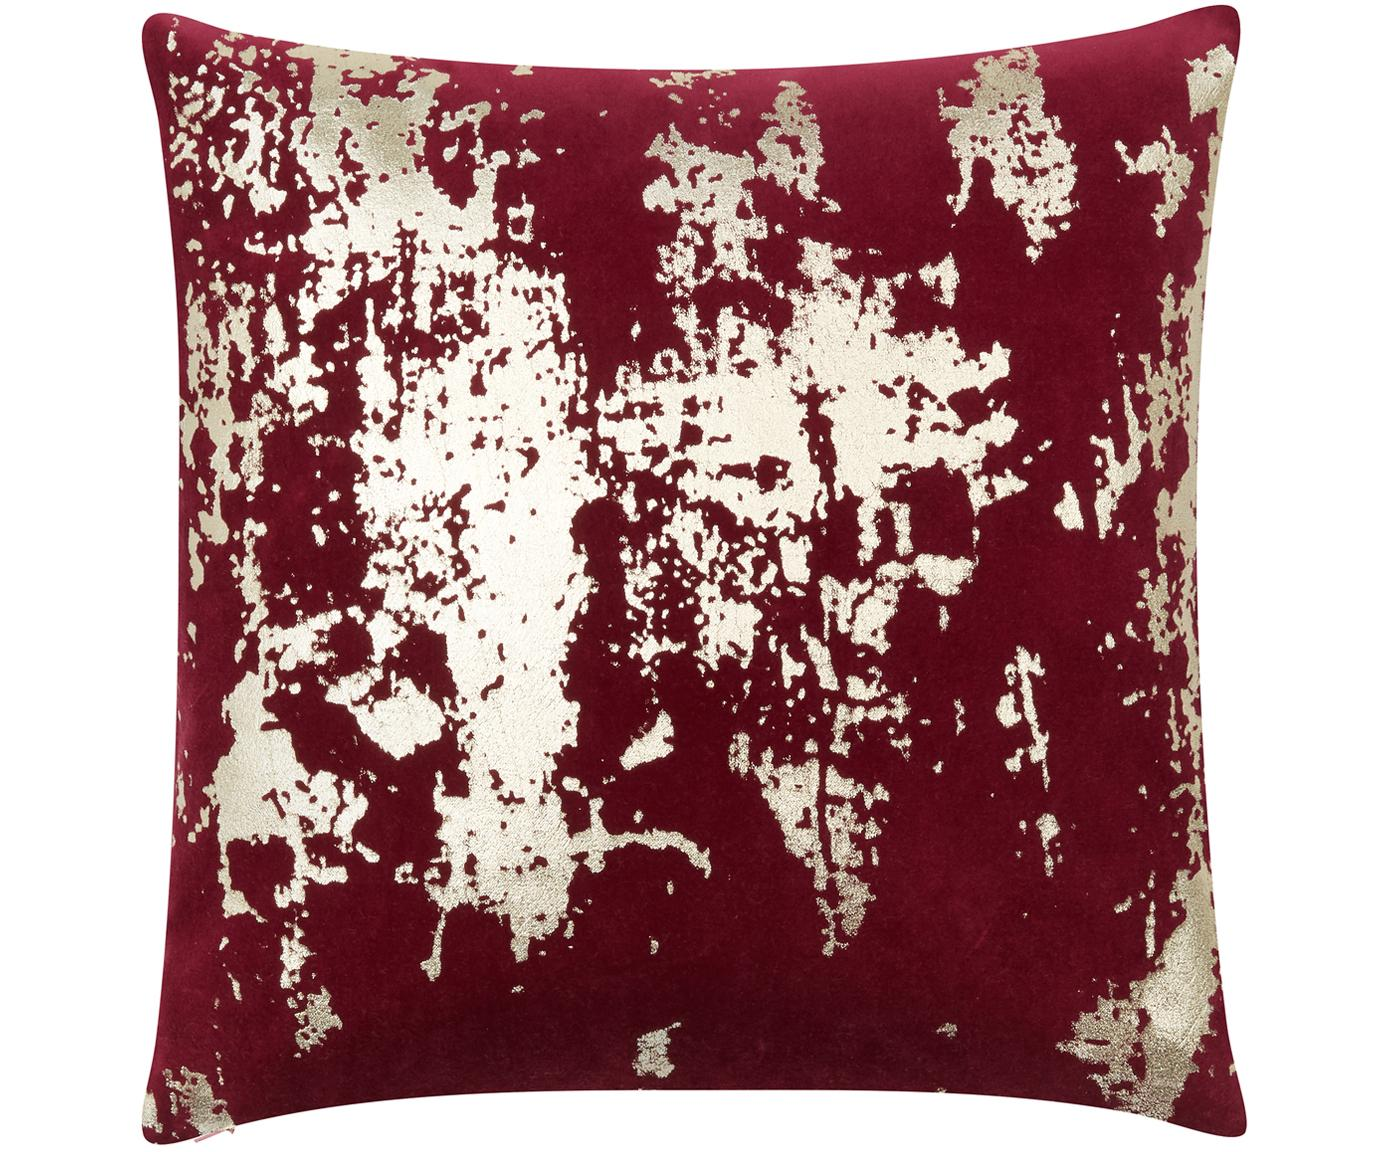 Fluwelen kussenhoes Shiny met glinsterend vintage patroon, Katoenfluweel, Rood, goudkleurig, 40 x 40 cm